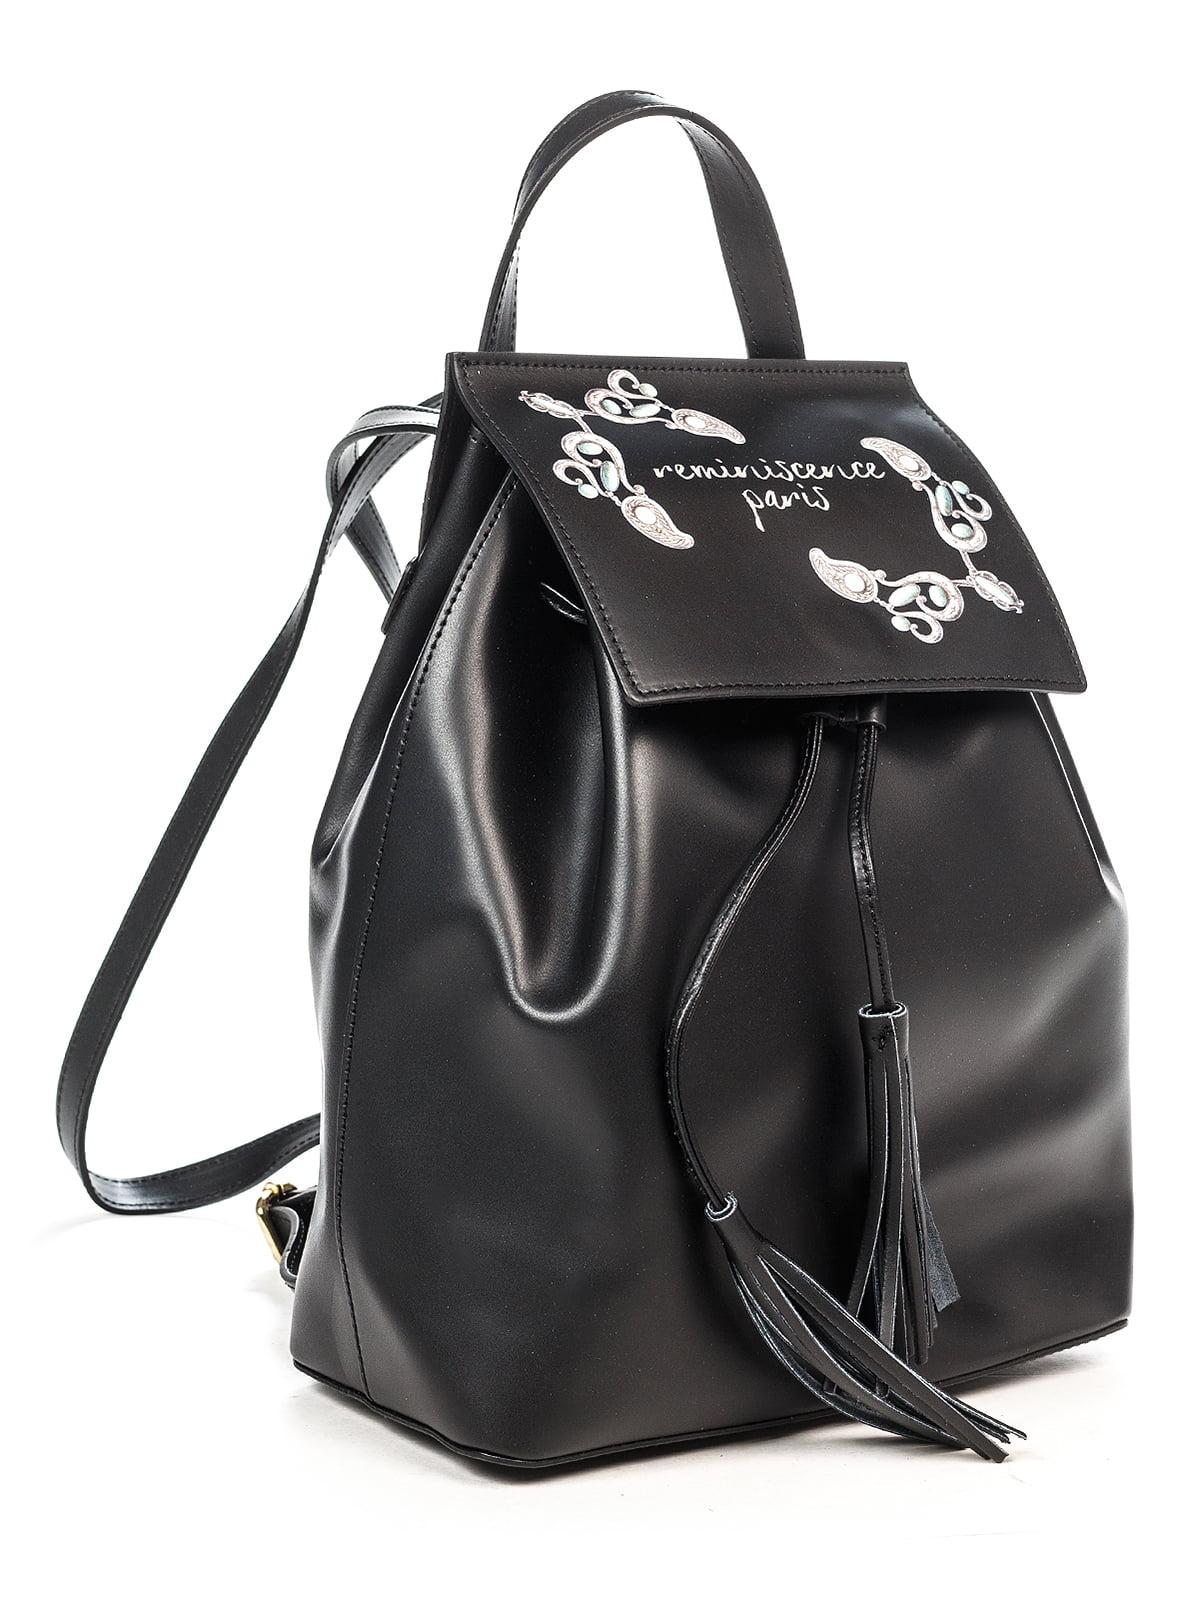 Рюкзак чорний | 4979548 | фото 3